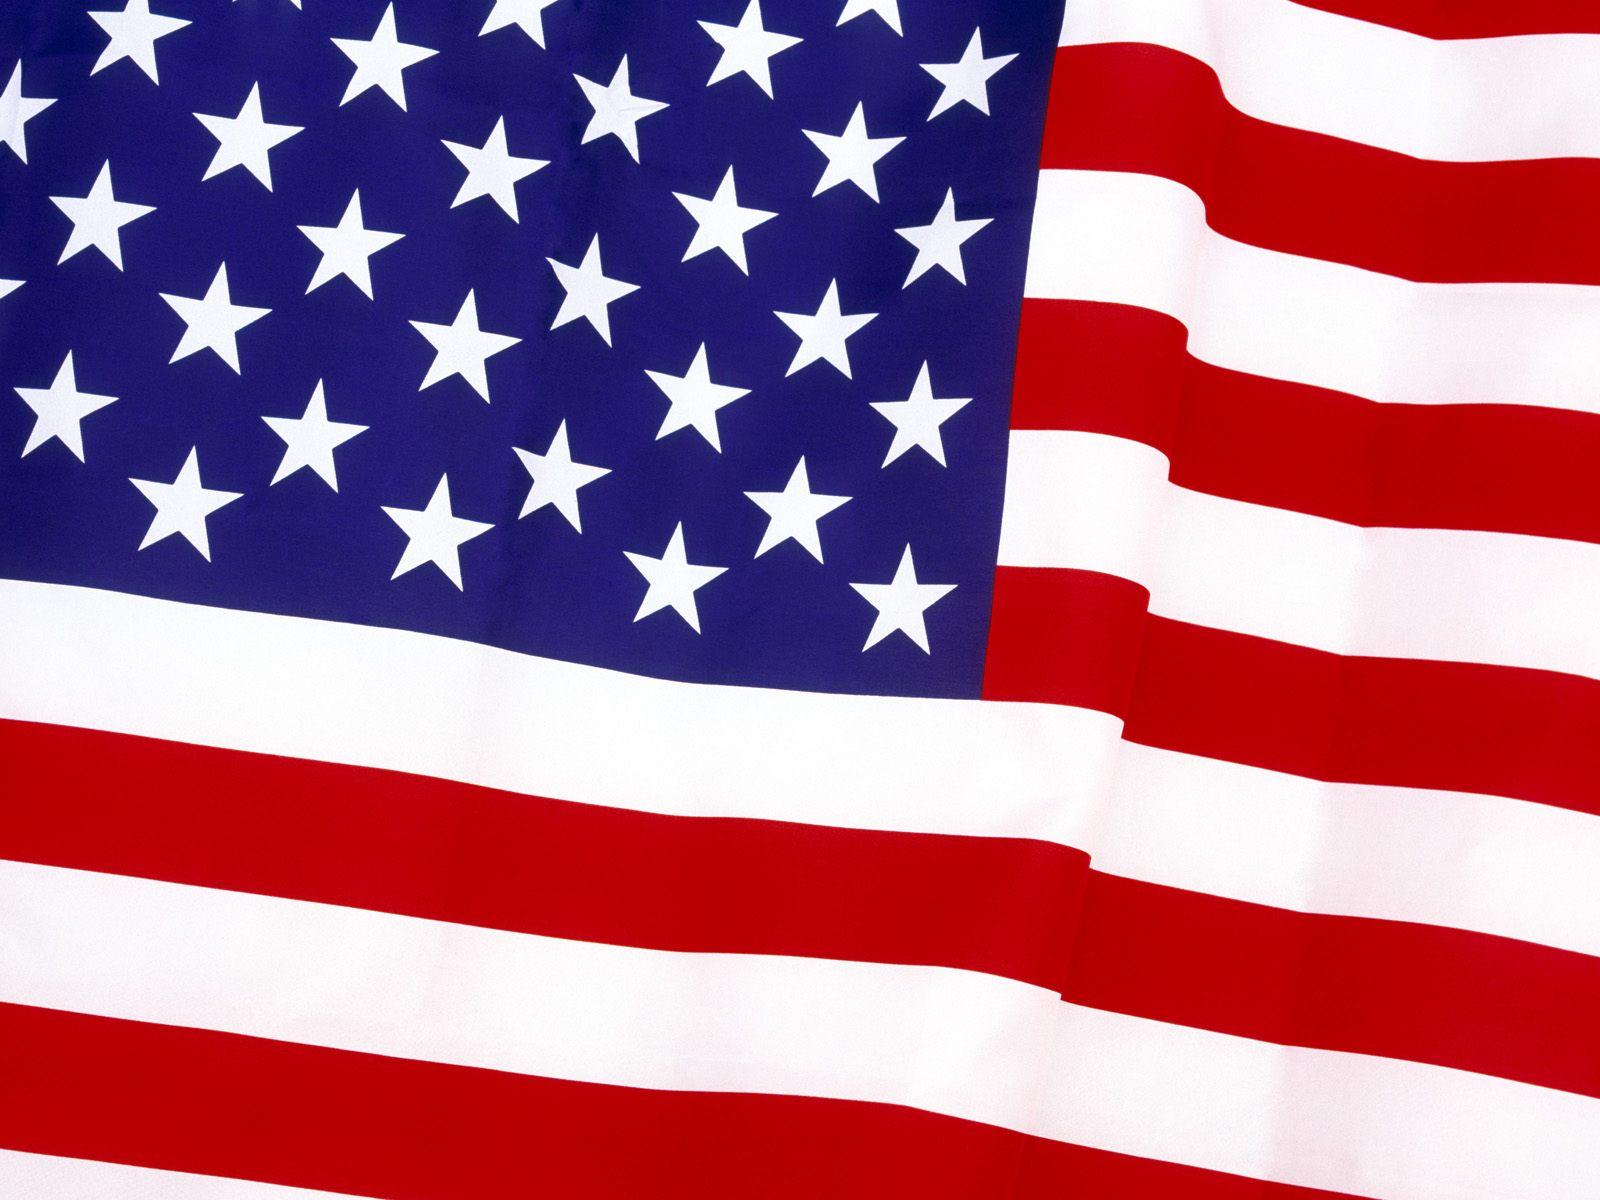 Digit Up America 1600x1200